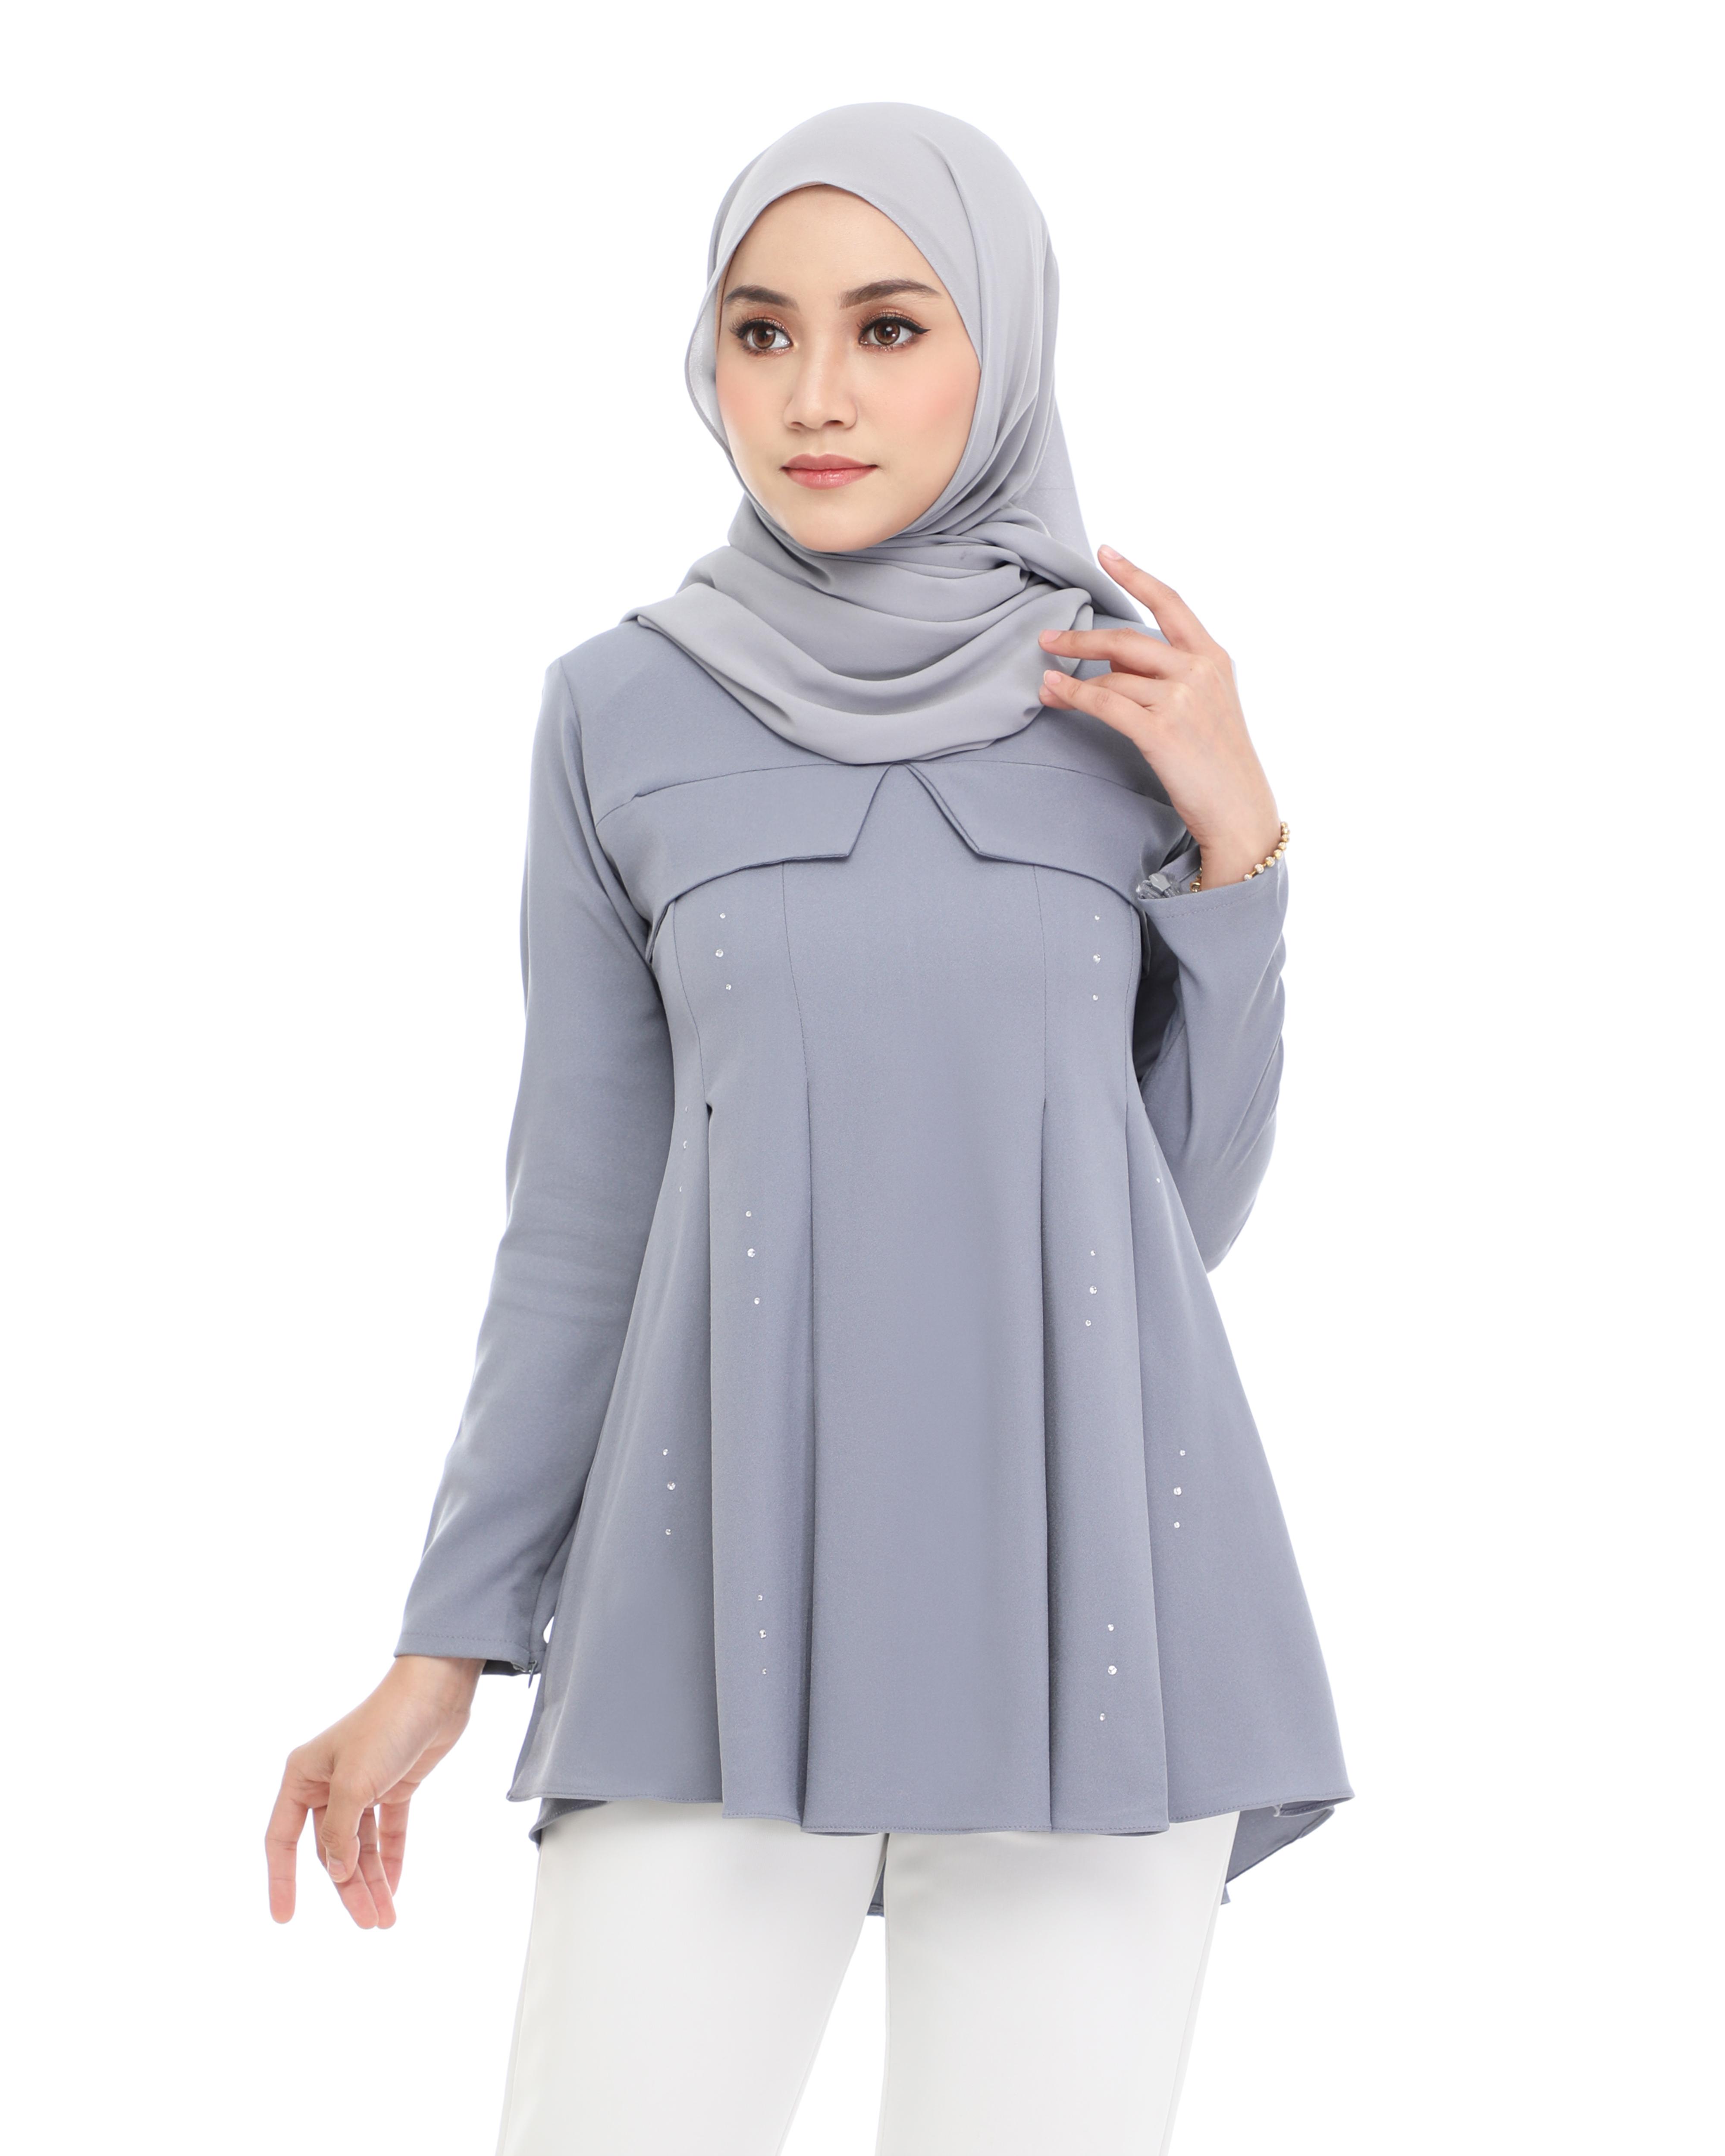 Carissa Blouse - Bluish Grey